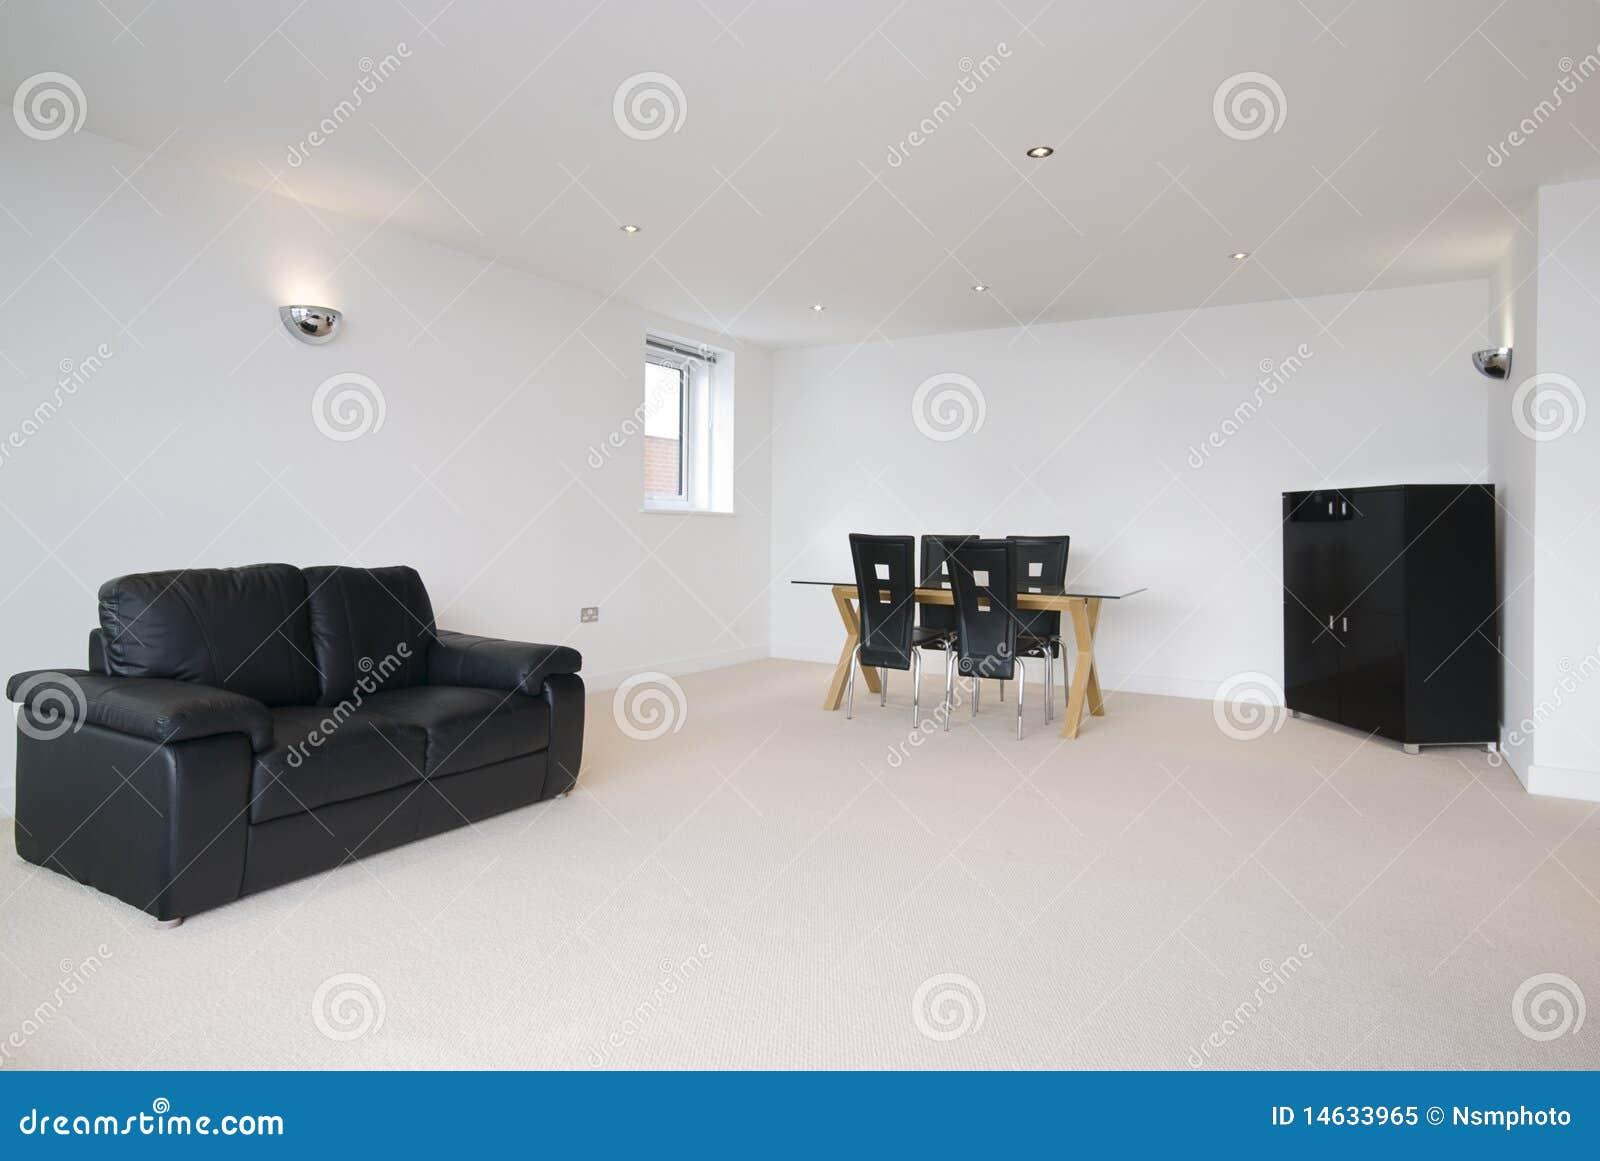 Ruime woonkamer met zwarte leerbank royalty vrije stock foto ...